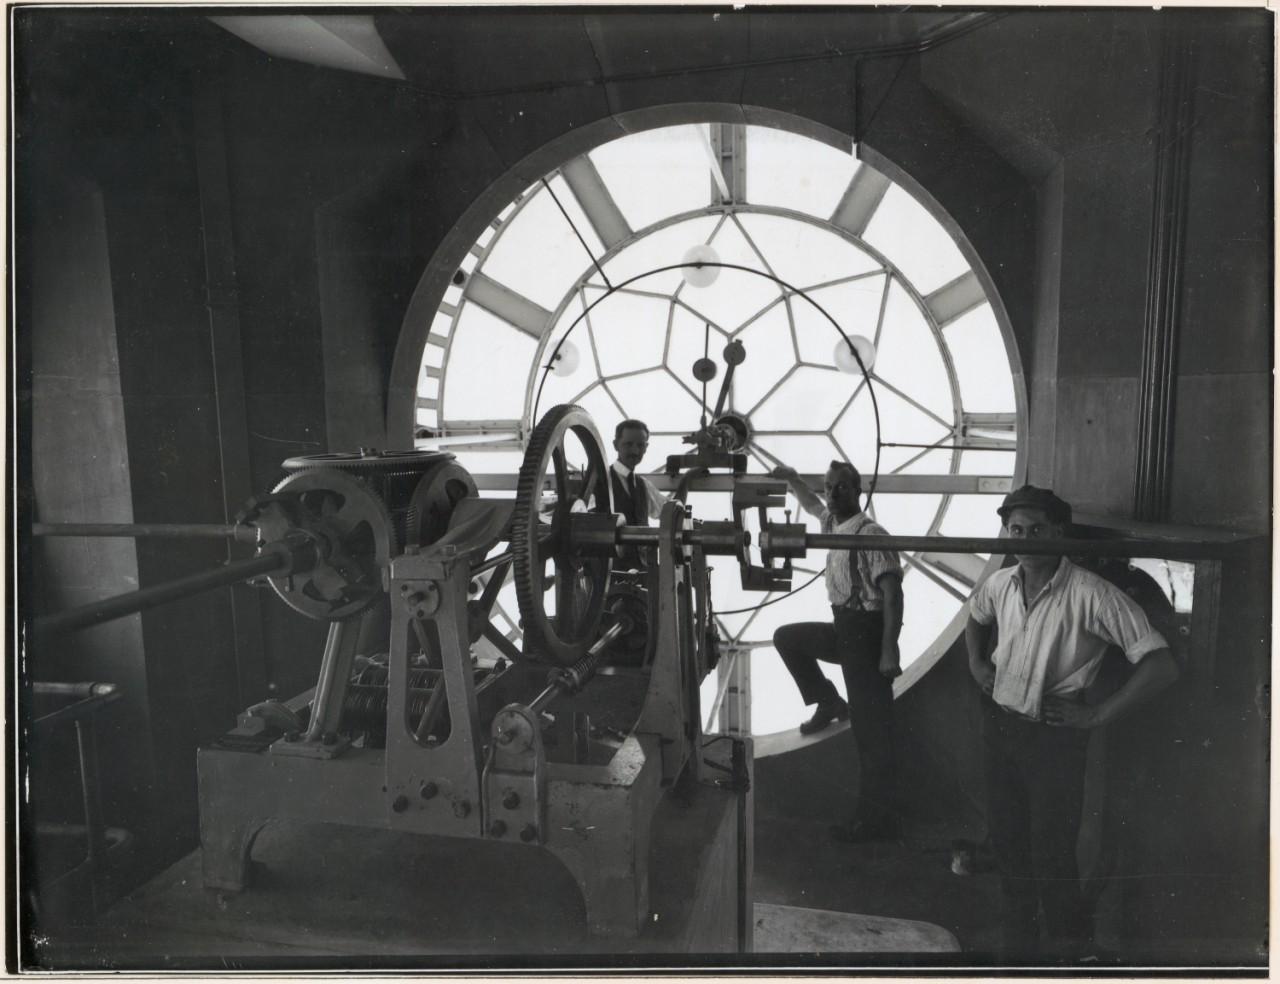 Le mécanisme de l'horloge en 1920